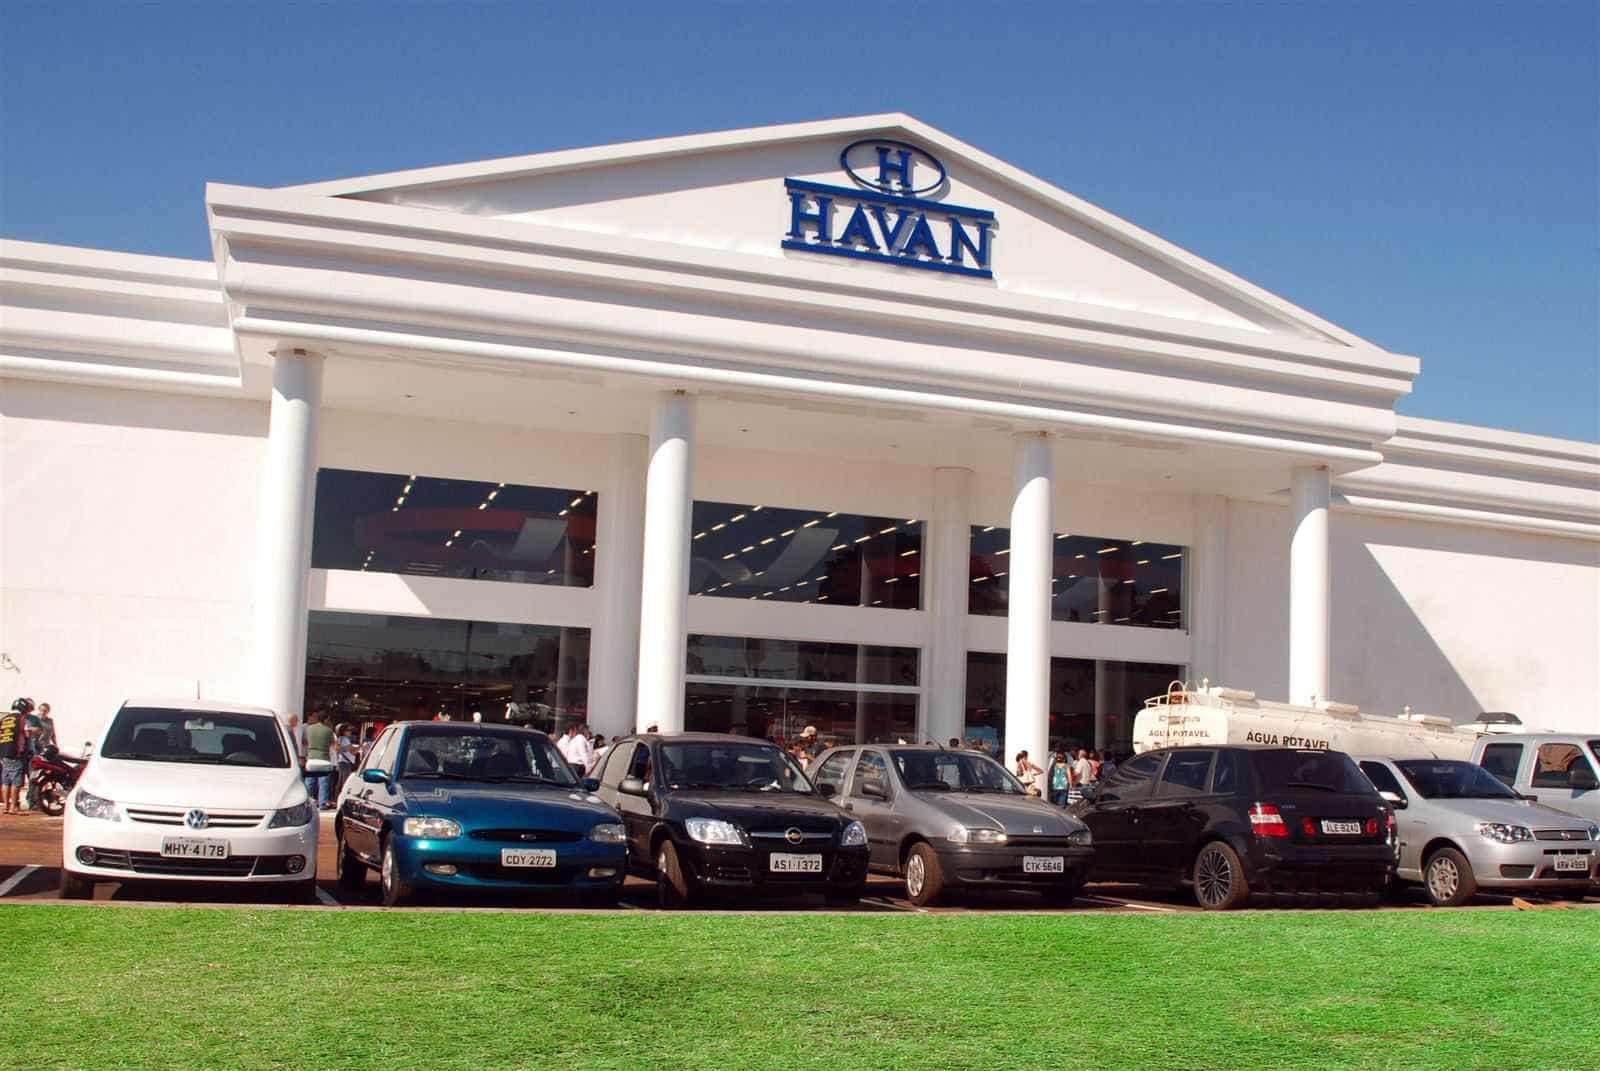 Queda de elevador deixa funcionários da Havan feridos em Maringá